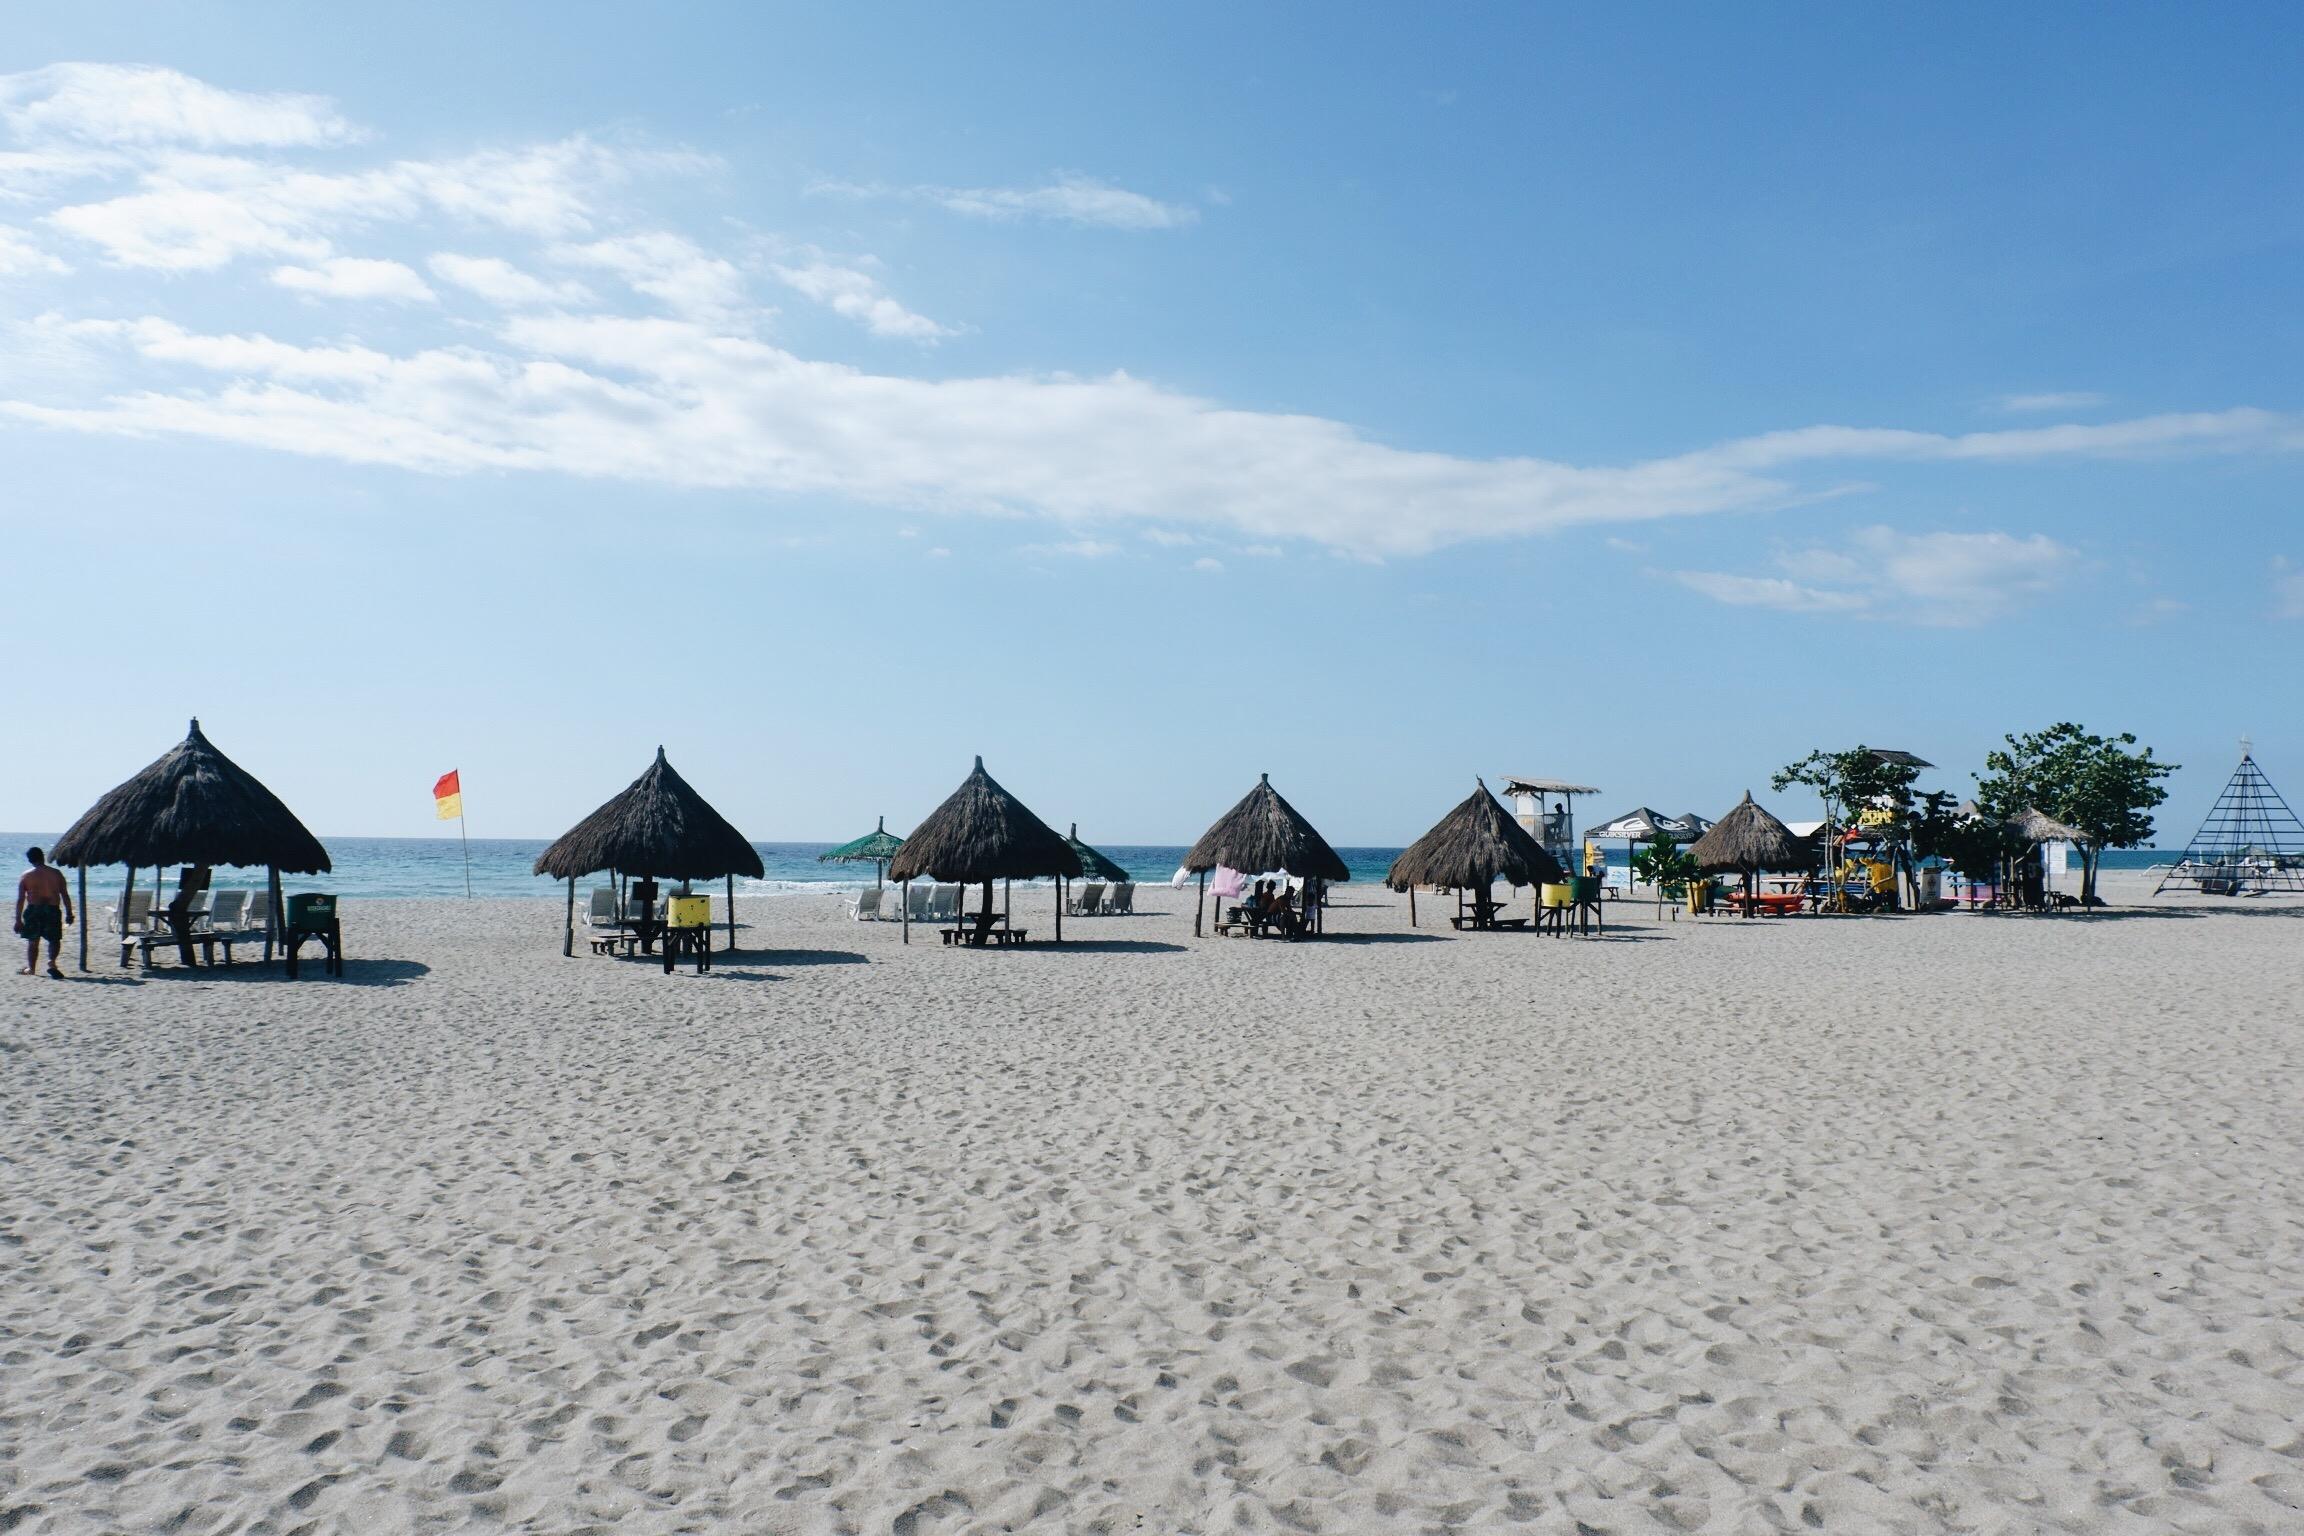 Crystal Beach Resort Capones Island Anawangin Cove